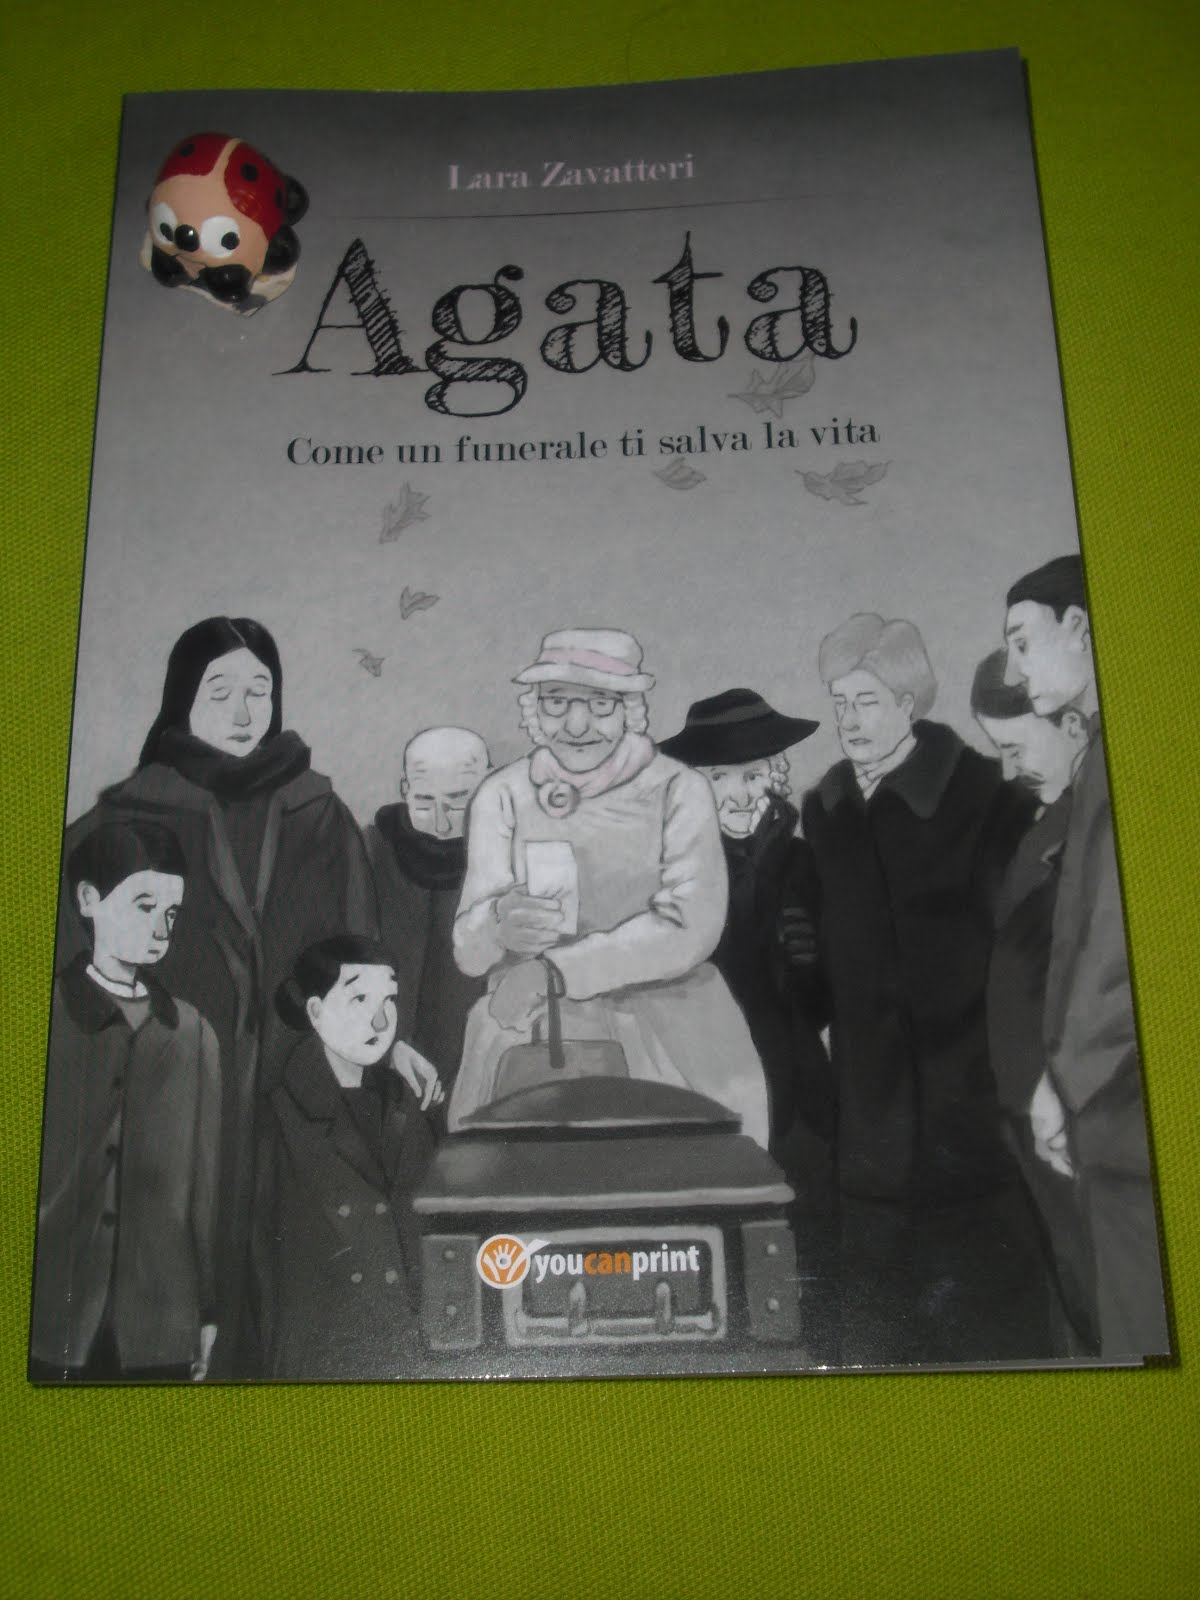 AGATA FOTOGALLERY